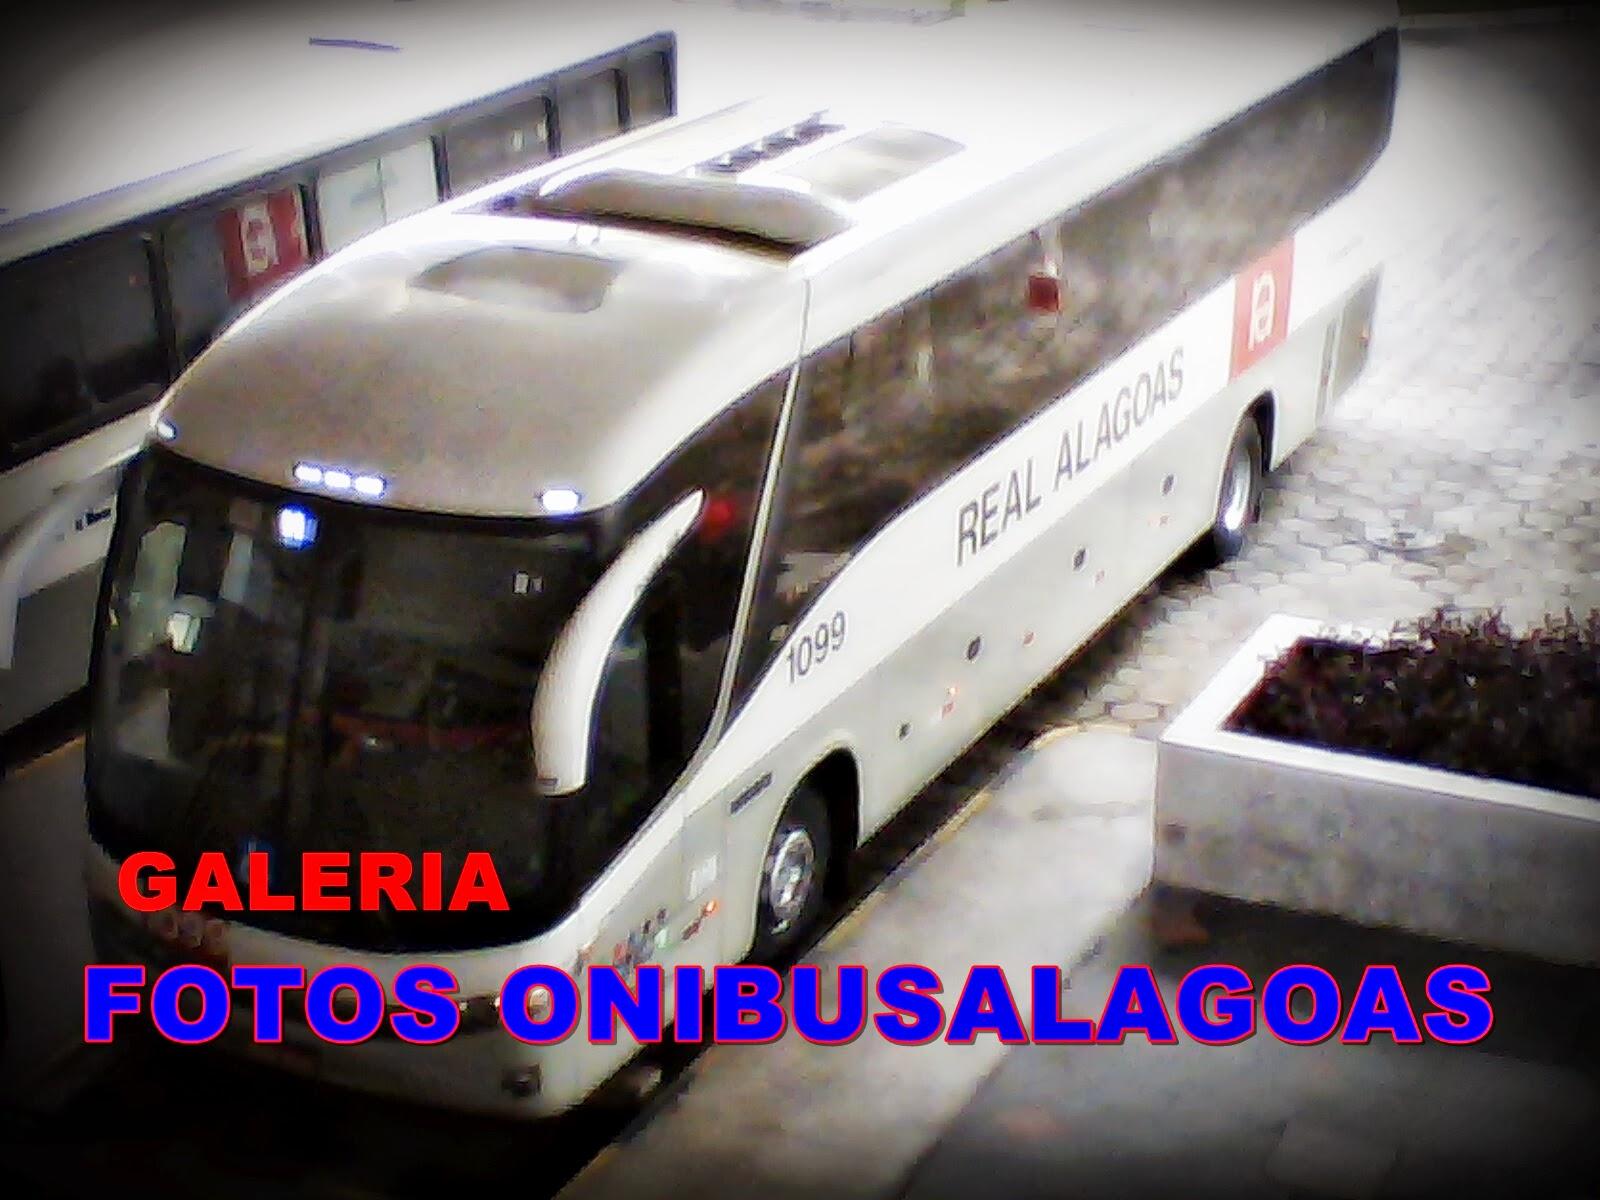 FOTOS  ONIBUSALAGOAS